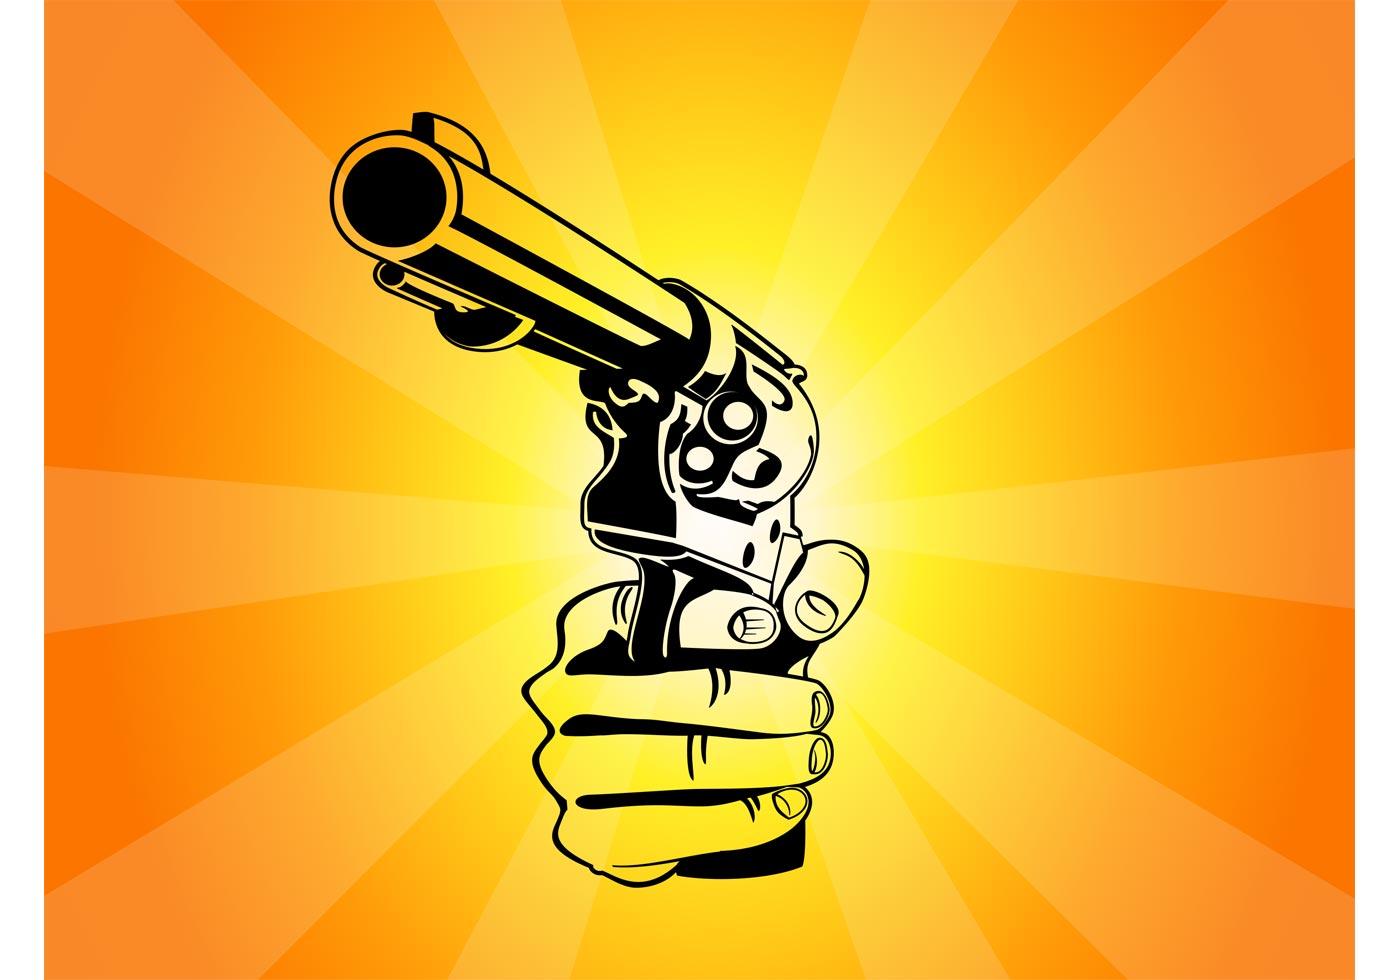 Pointing Gun Vector - Download Free Vector Art, Stock ...